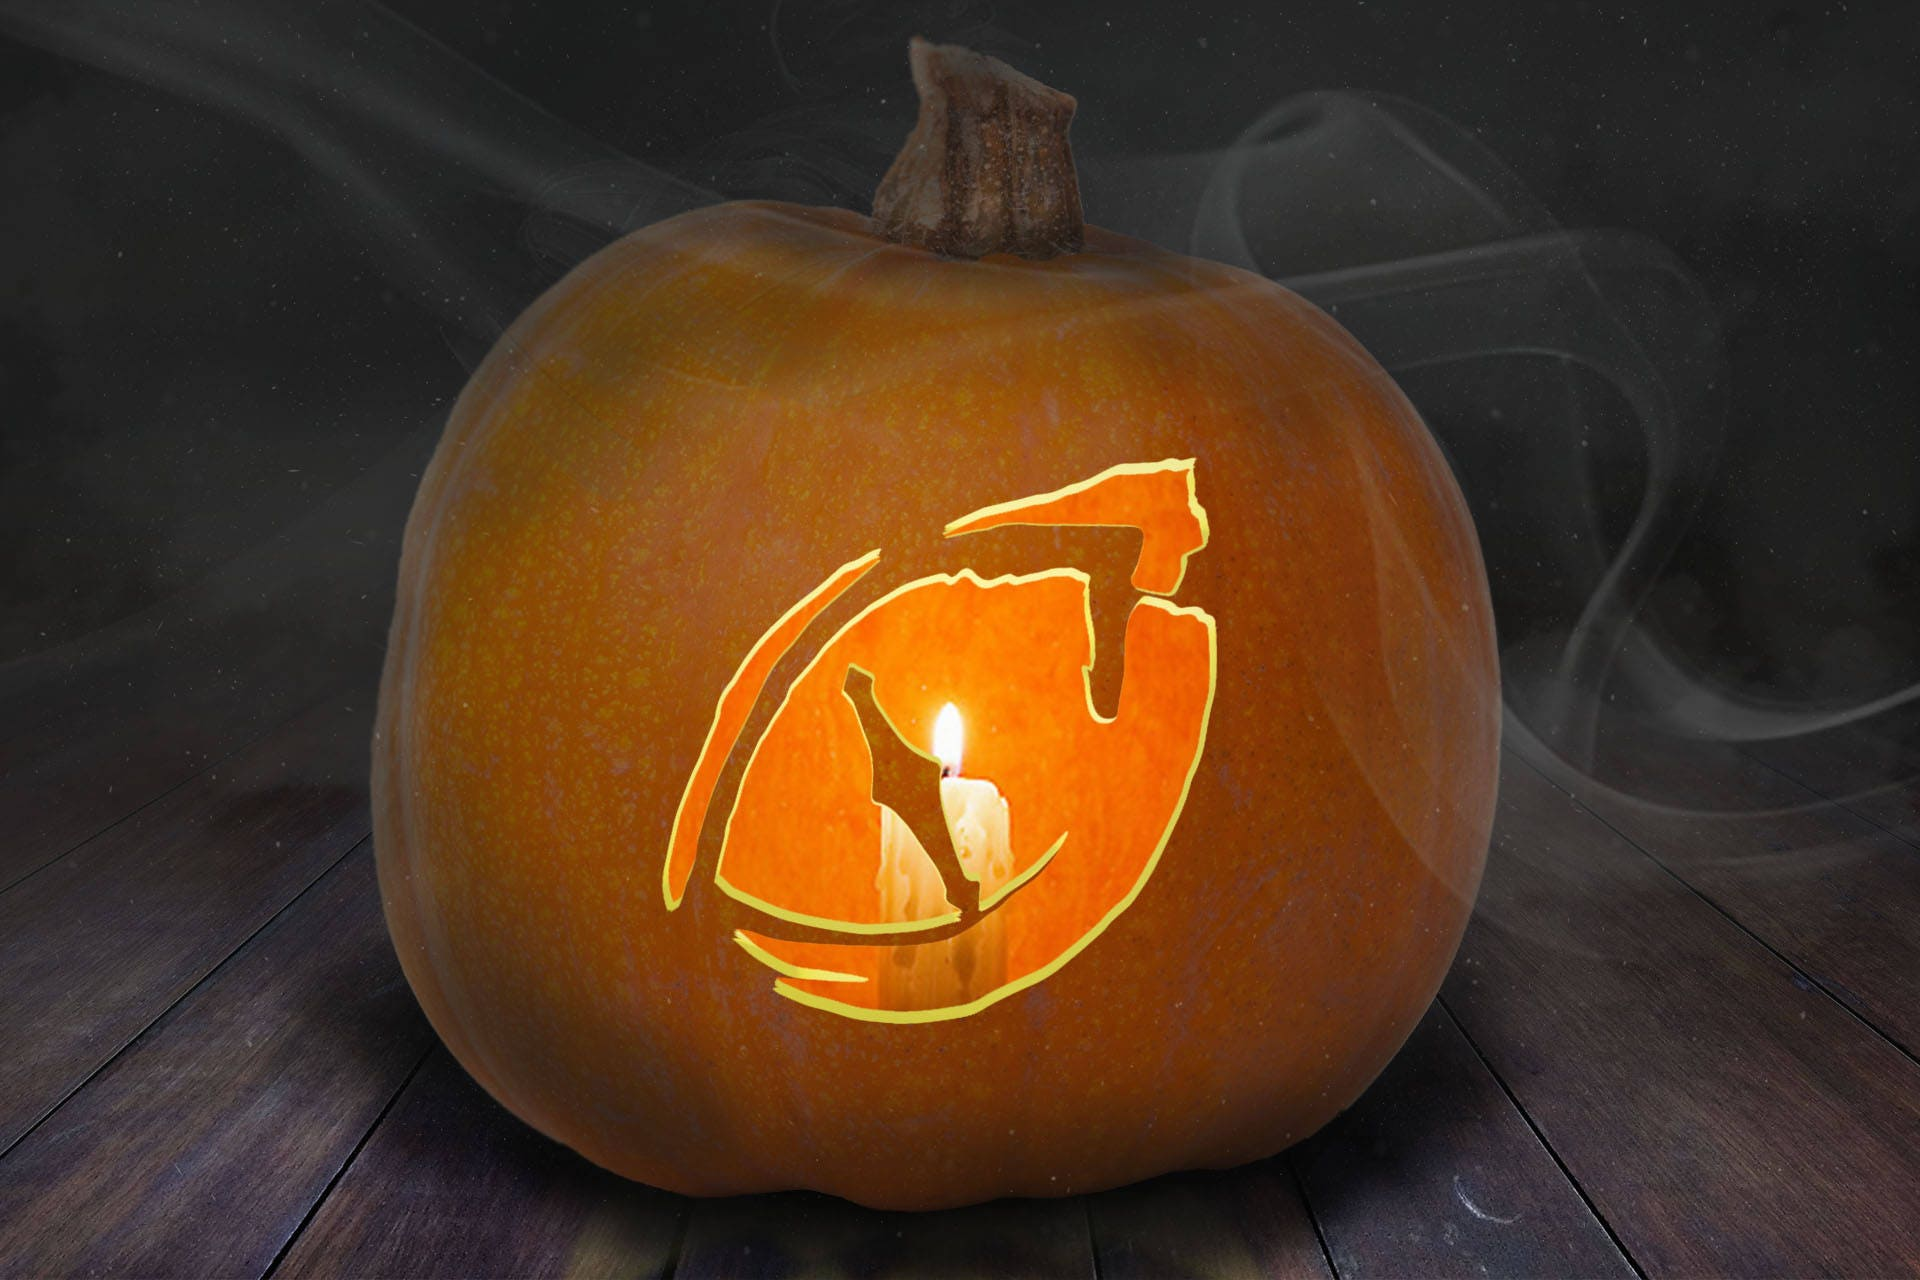 dragon eye pumpkin carving stencil printable